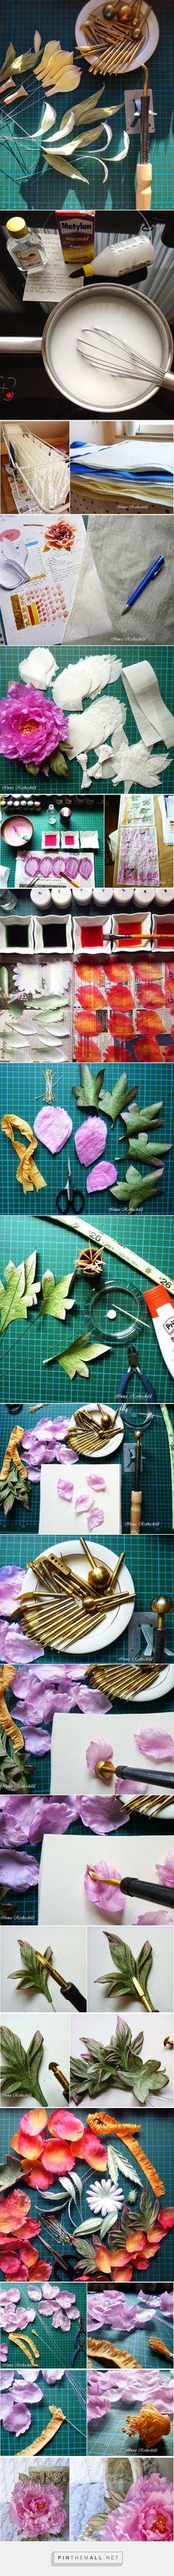 Шелковые фантазии и...: Как сделать цветок из шелка? http://silkflower-accessories-and-deko.blogspot.ru/2014/07/How-to-make-a-silk-flower.html